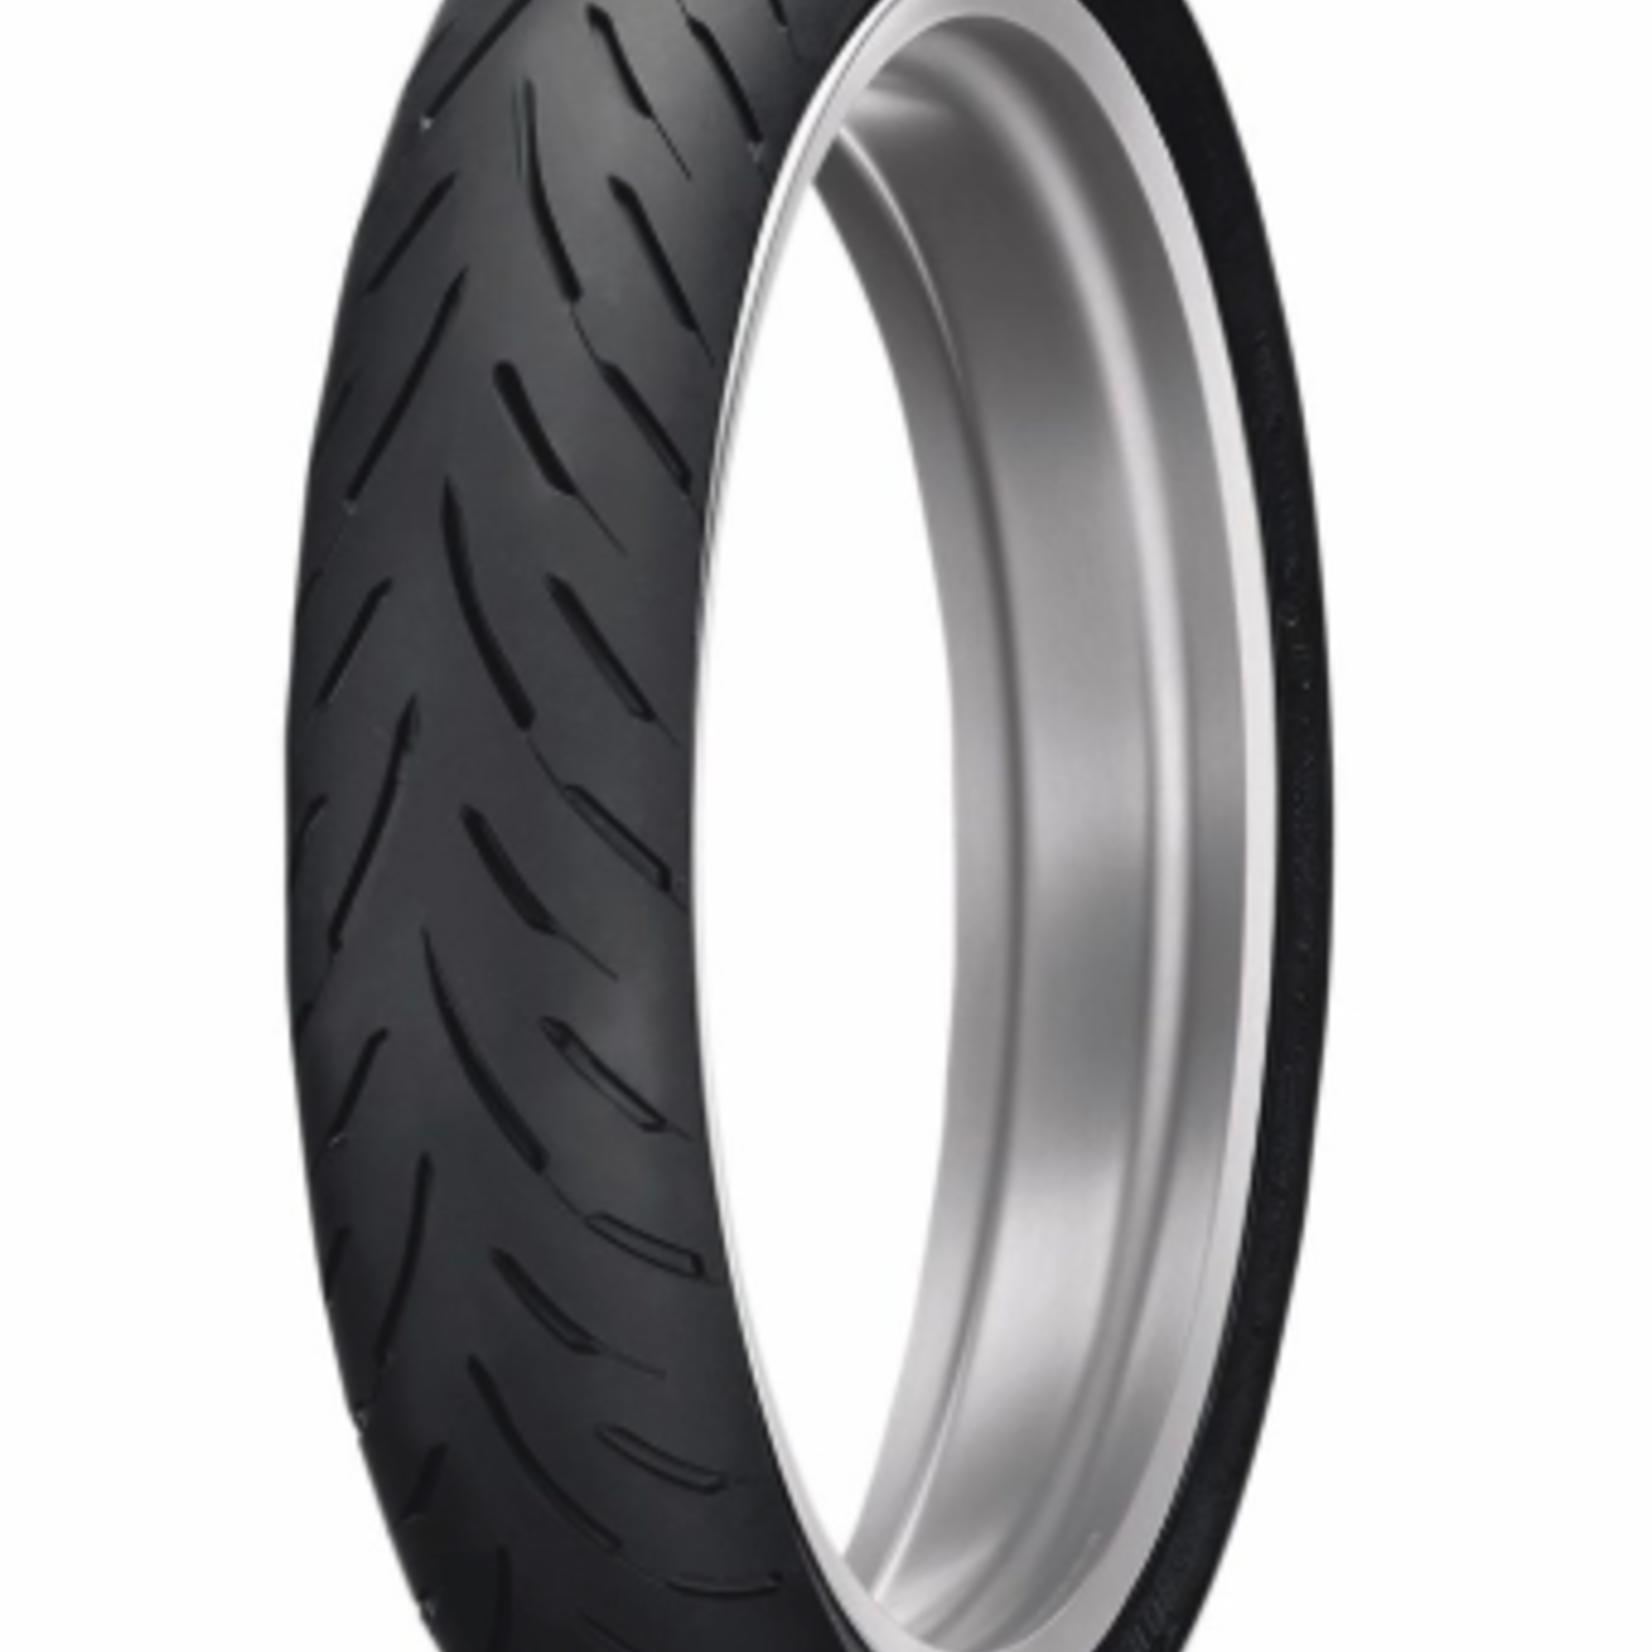 Dunlop Dunlop Sportmax GPR300 Motorcycle Tire - Front - 120/70-17